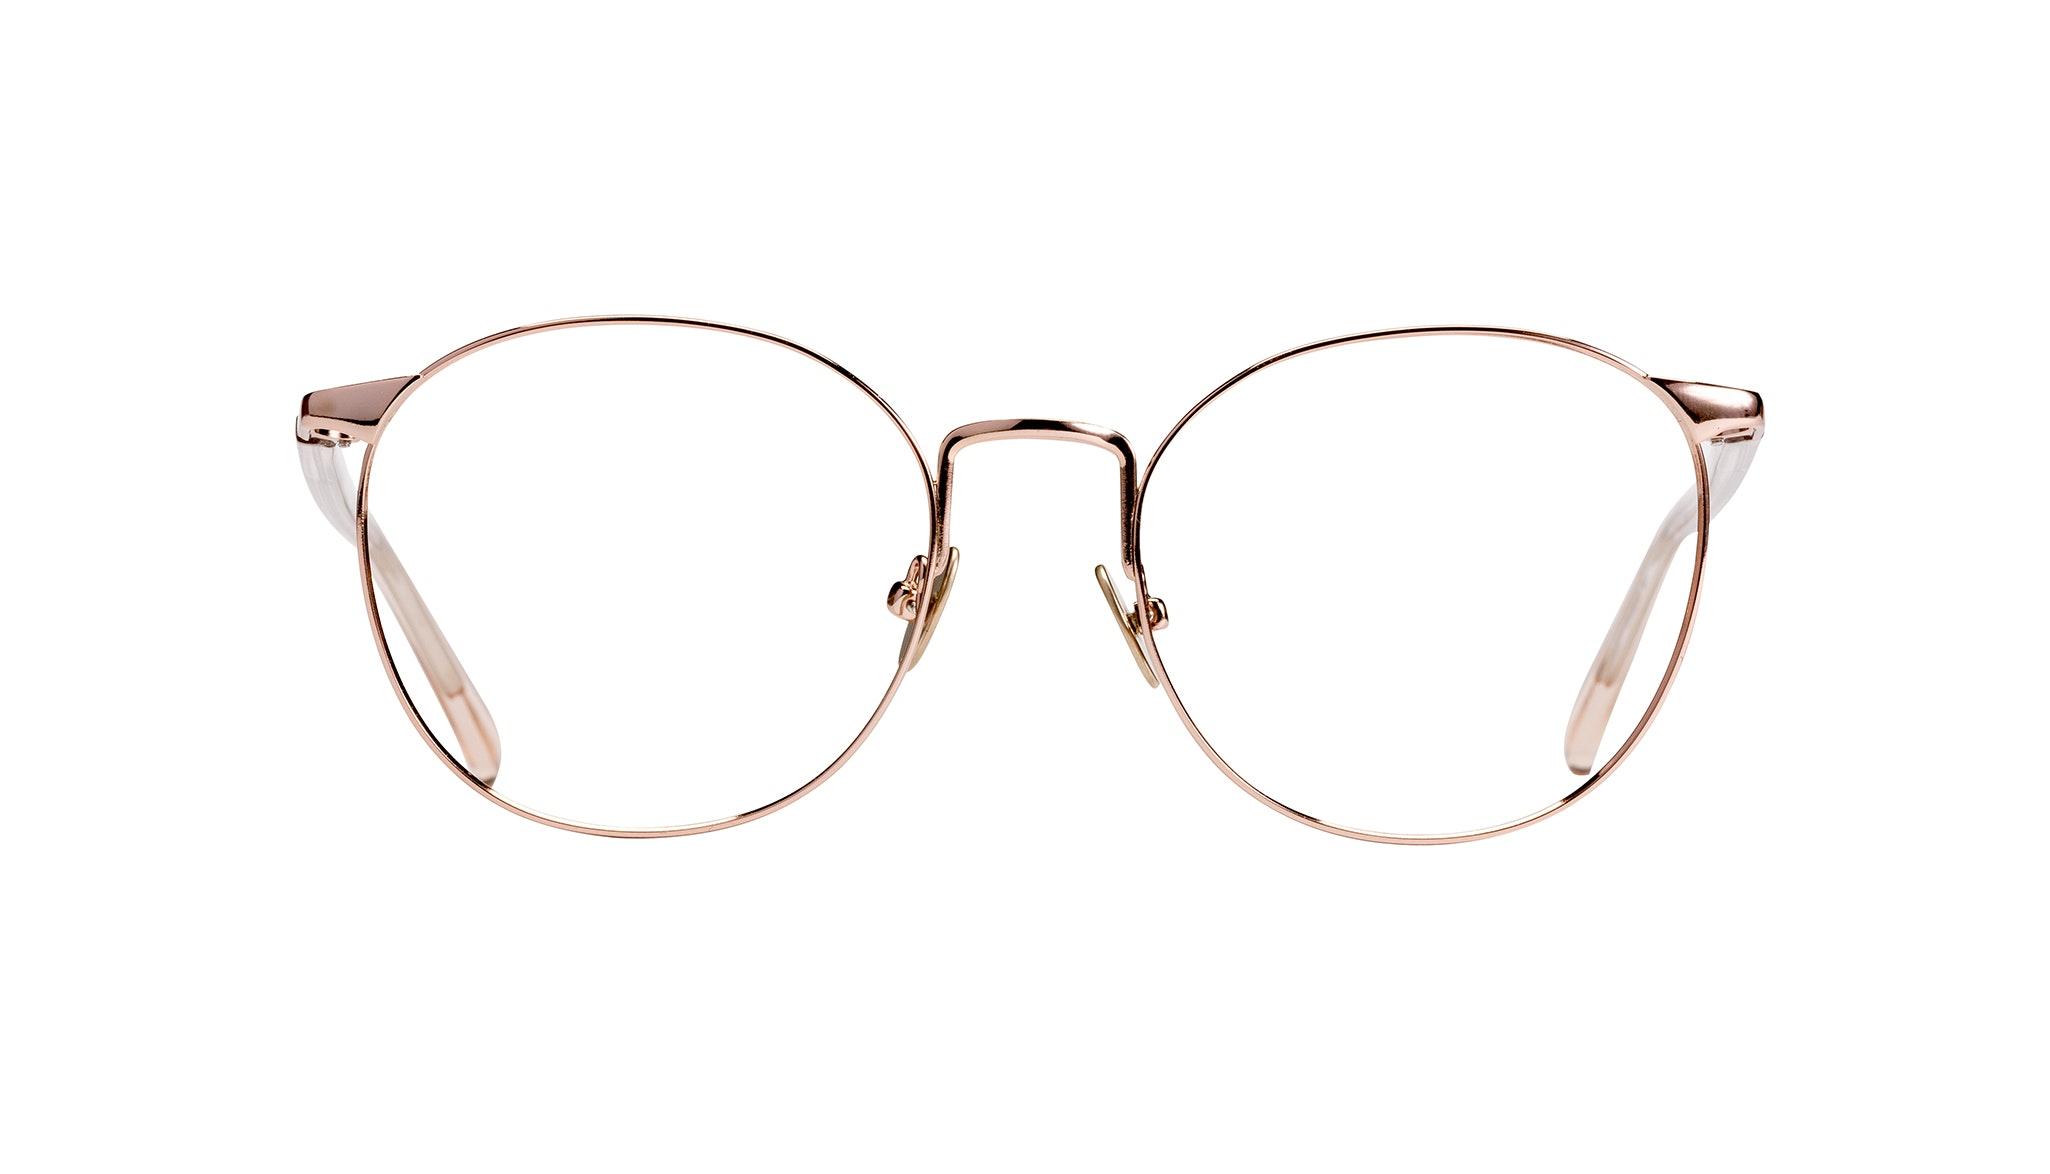 Affordable Fashion Glasses Round Eyeglasses Women Romy Aurore